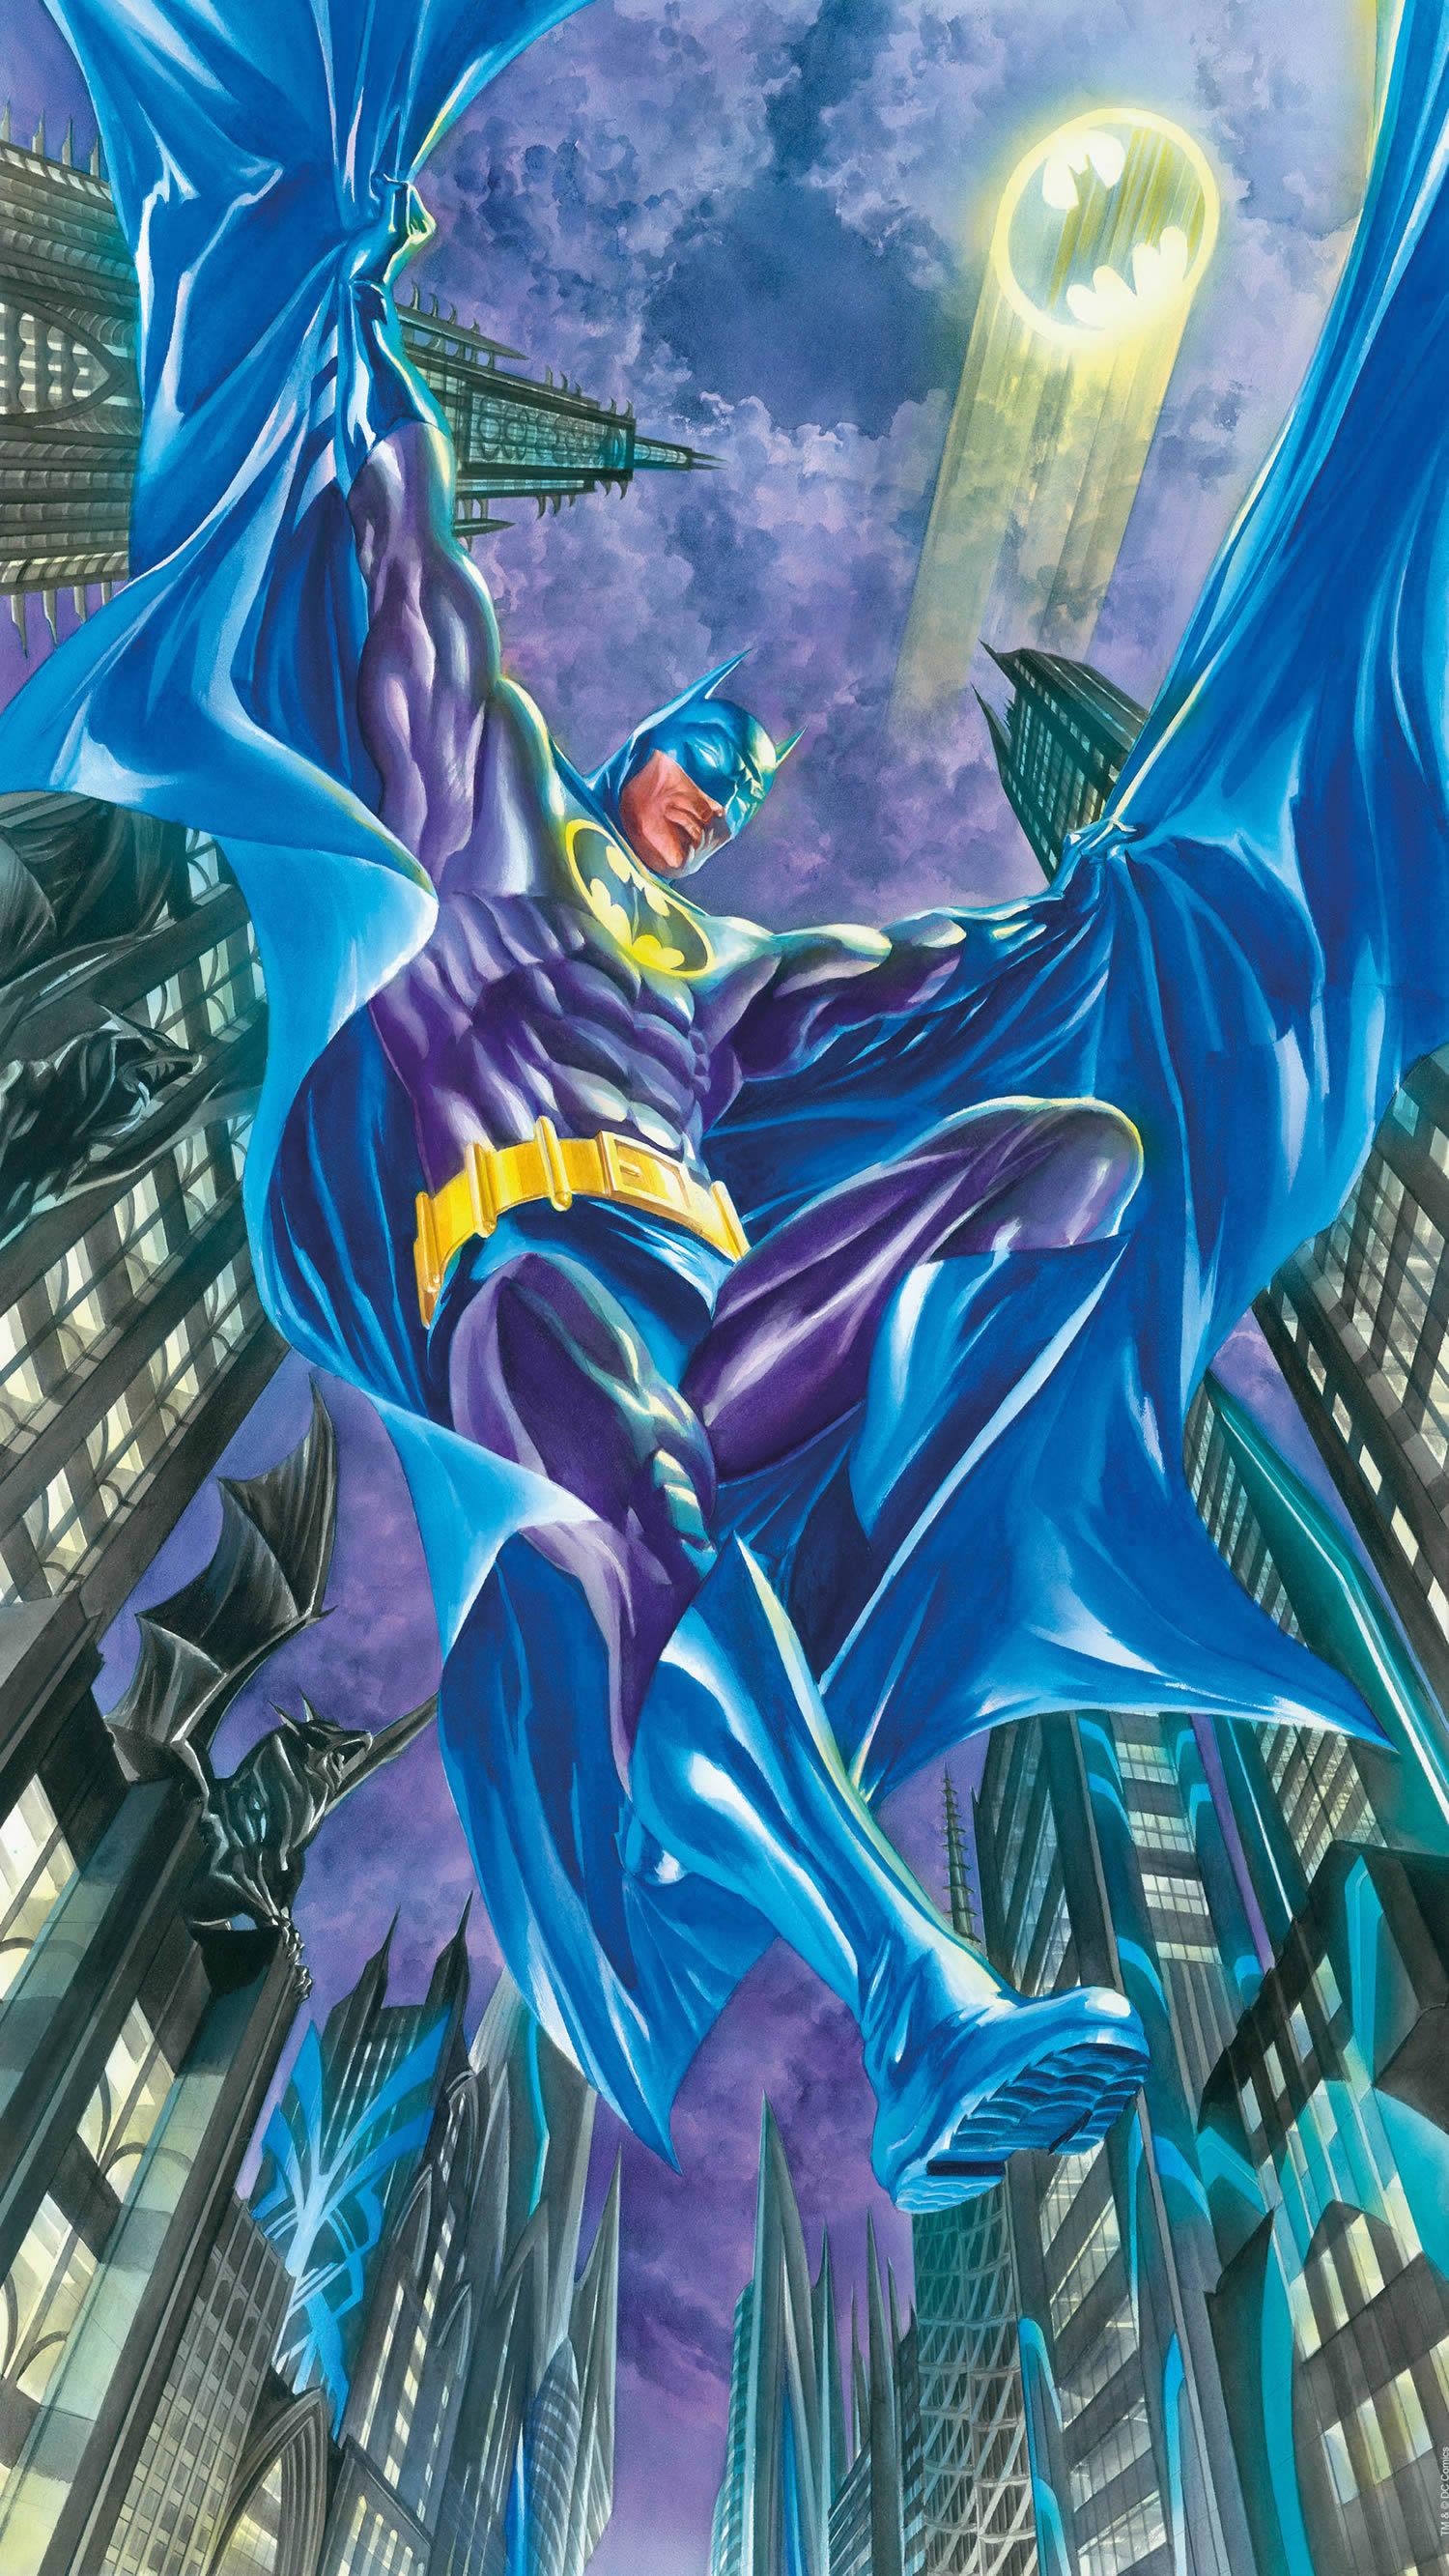 Batman: Dark Knight Detective by alex ross